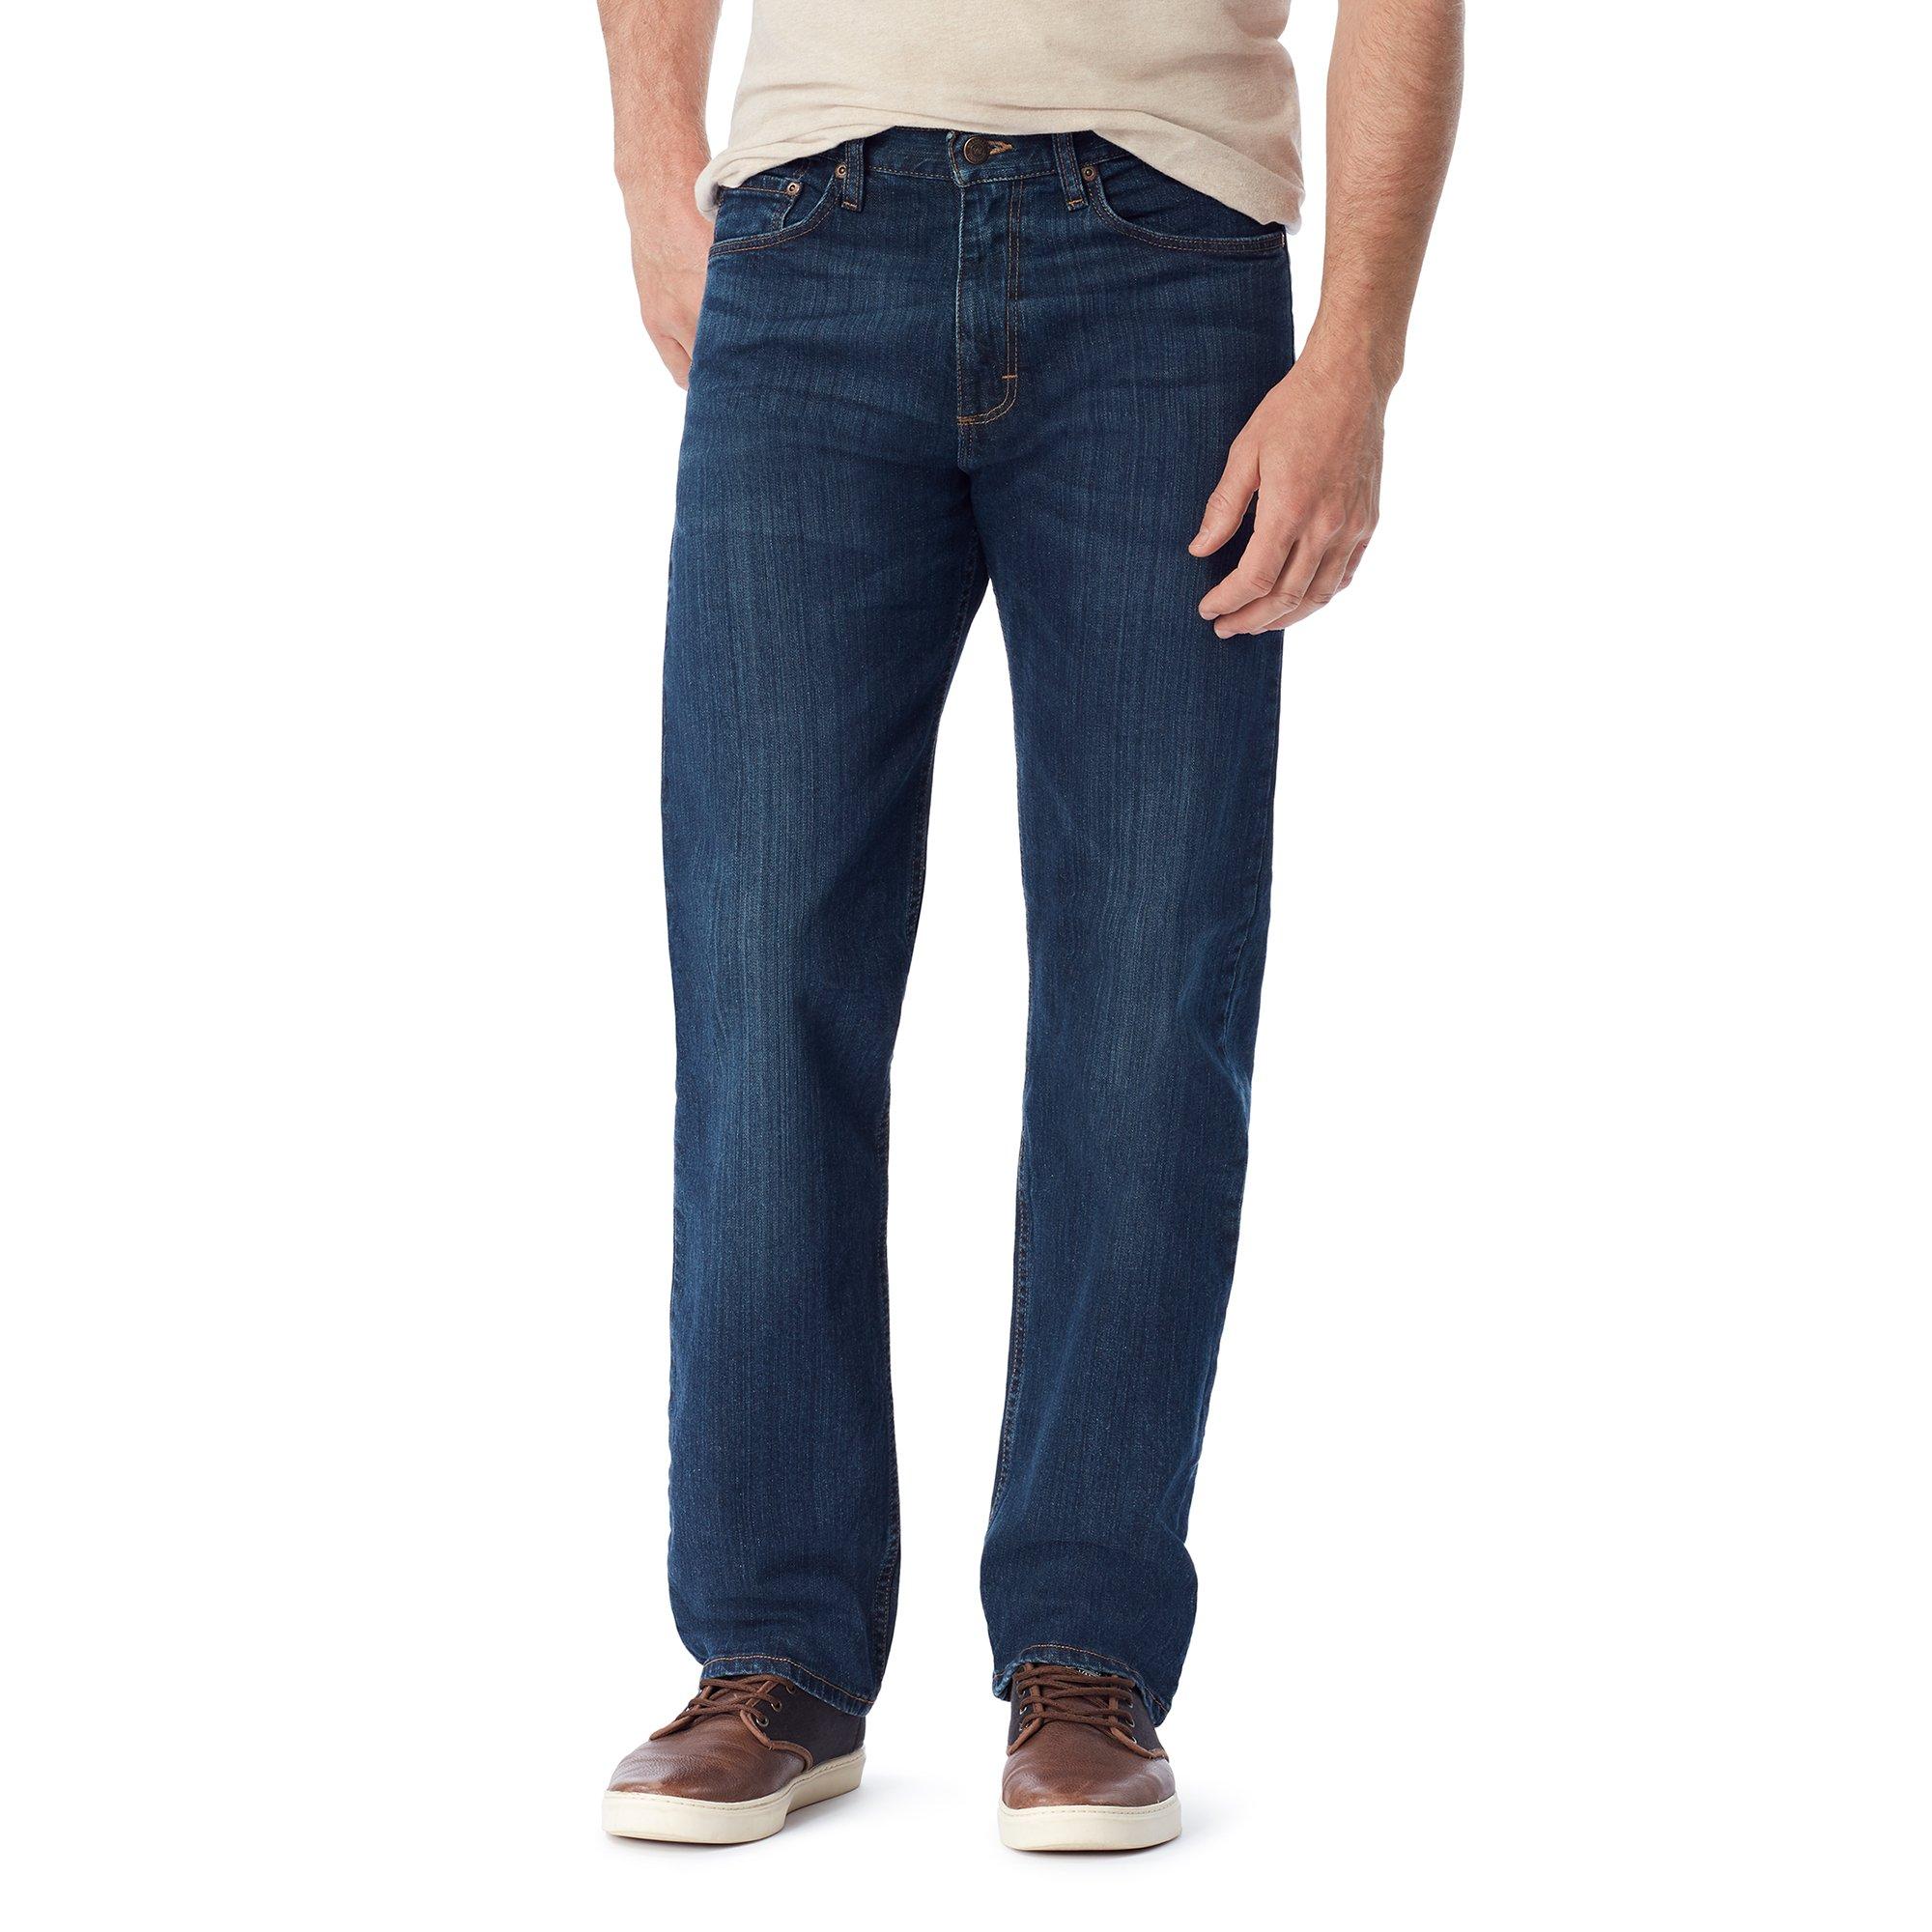 Wrangler Authentics Men's Classic Relaxed Fit Jean, Dark Flex 36x32